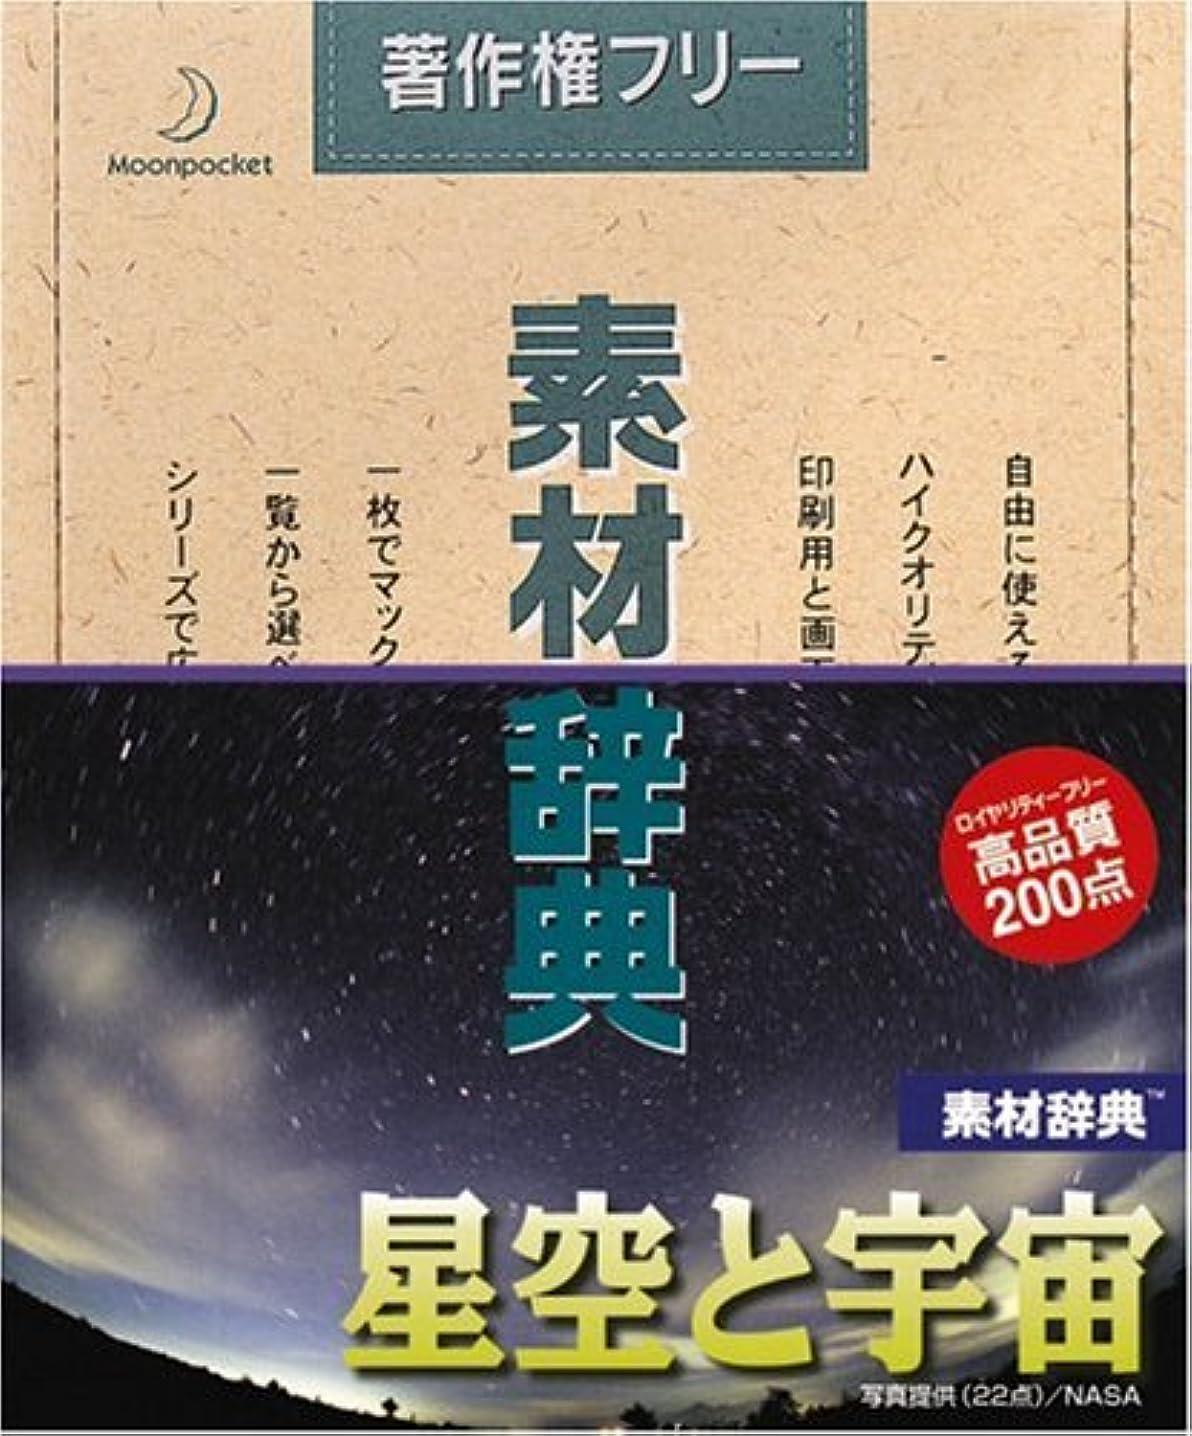 肯定的価値進化する素材辞典 Vol.70 星空と宇宙編